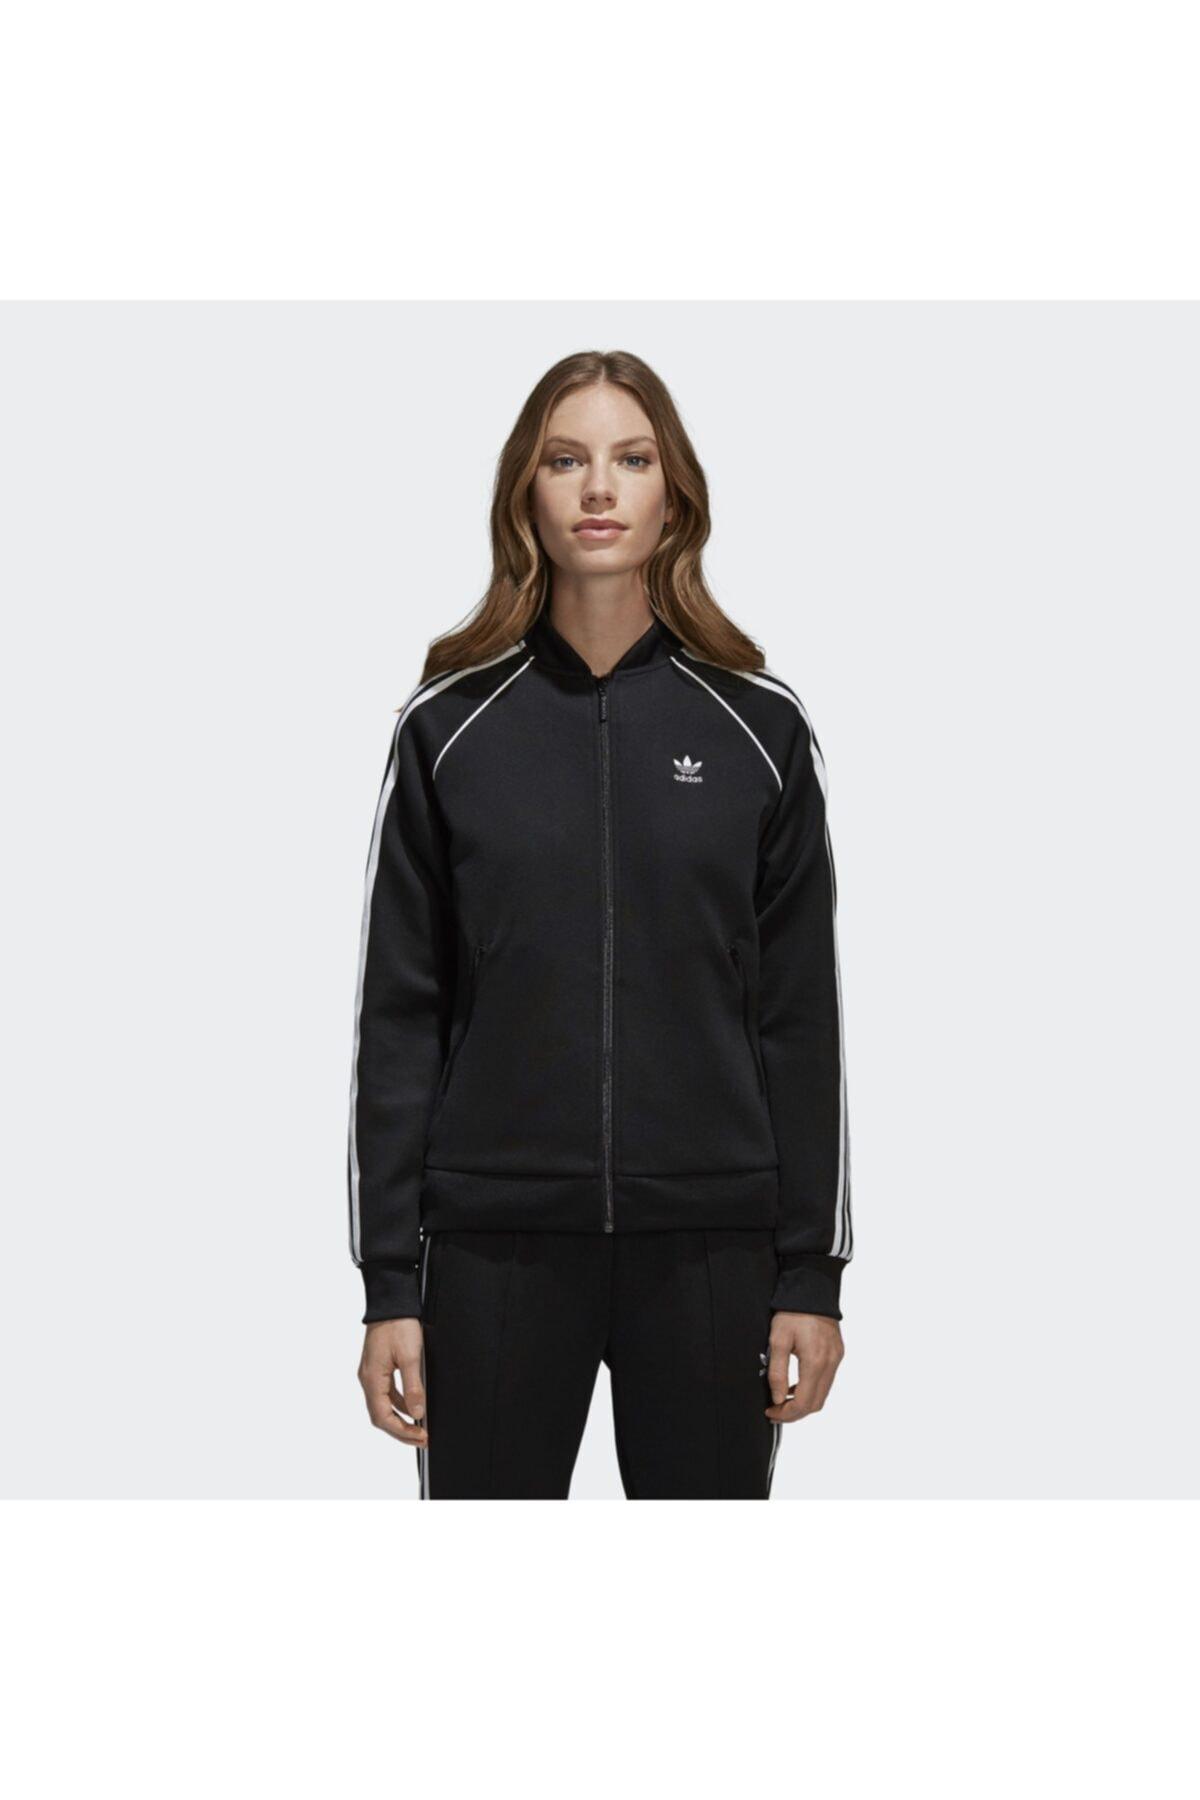 adidas Kadın Sweatshirt - Sst Tt - Ce2392 1